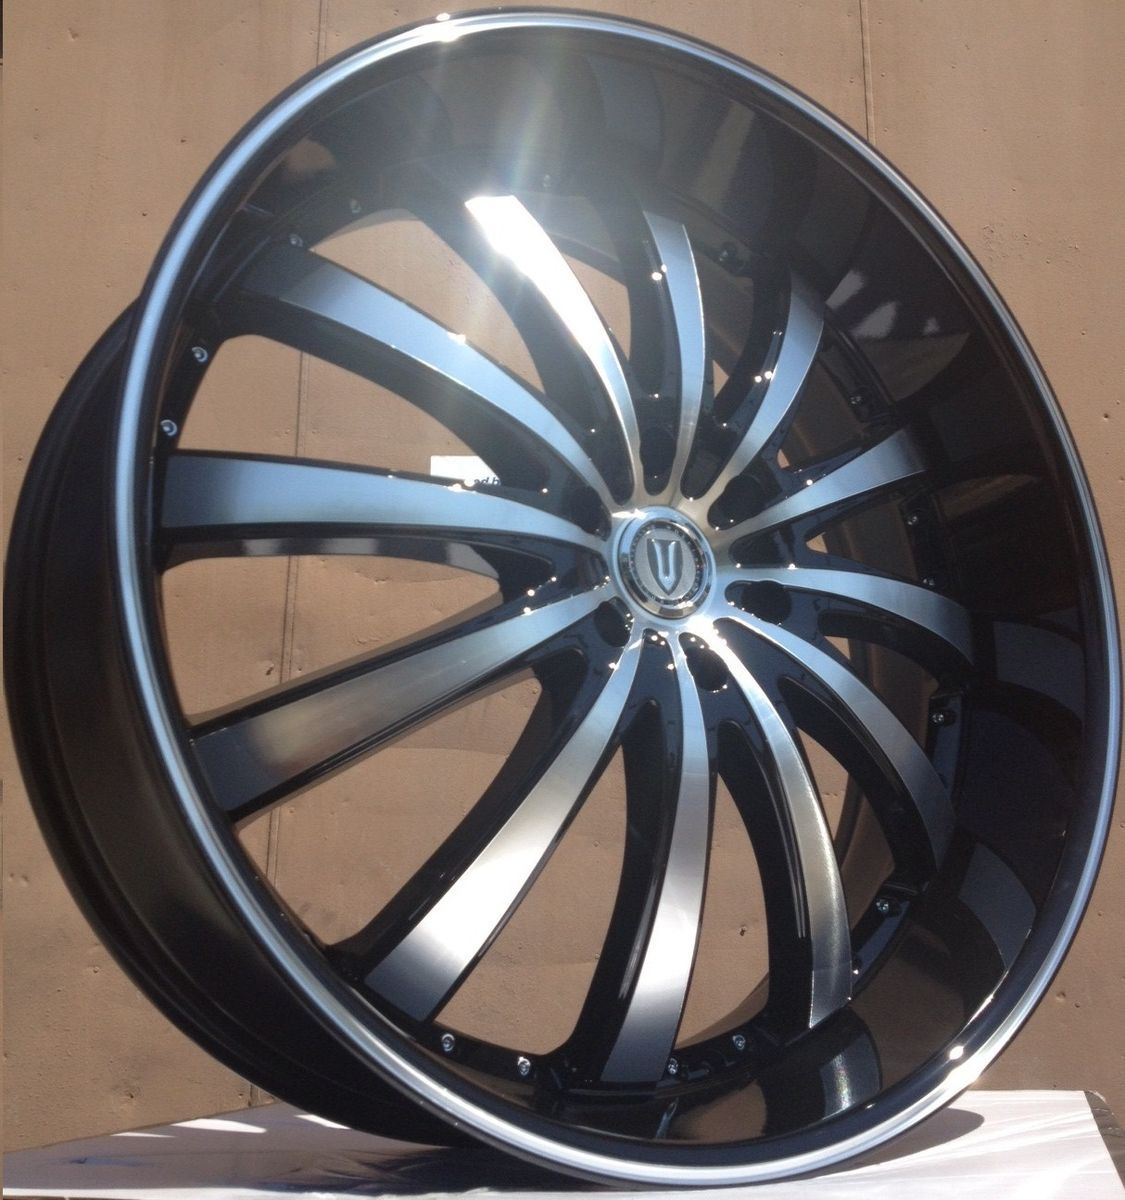 Black Wheels Tires 6x139 7 Escalade 2007 2008 2009 2010 2011 12